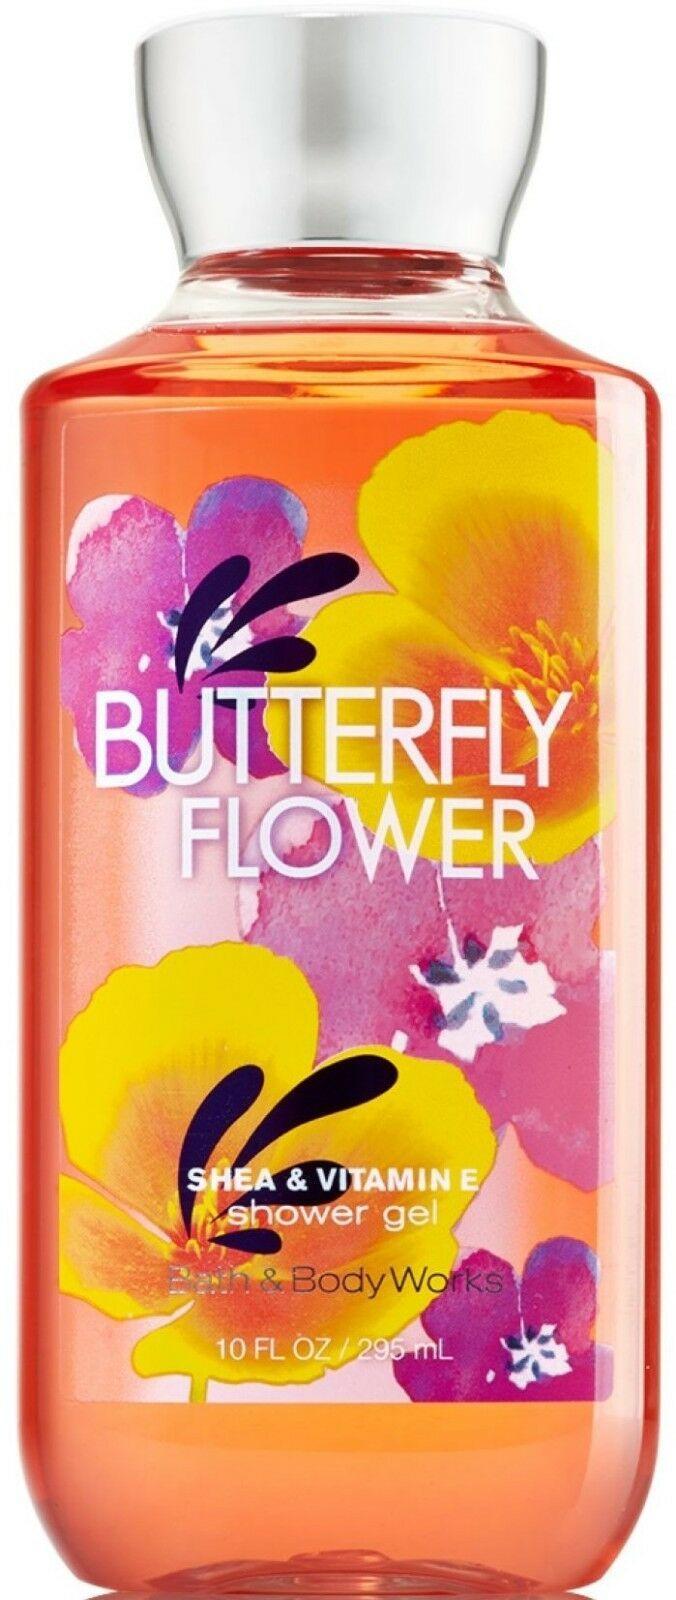 Bath & Body Works Butterfly Flower Shower Gel Body Lotion & Body Cream Set